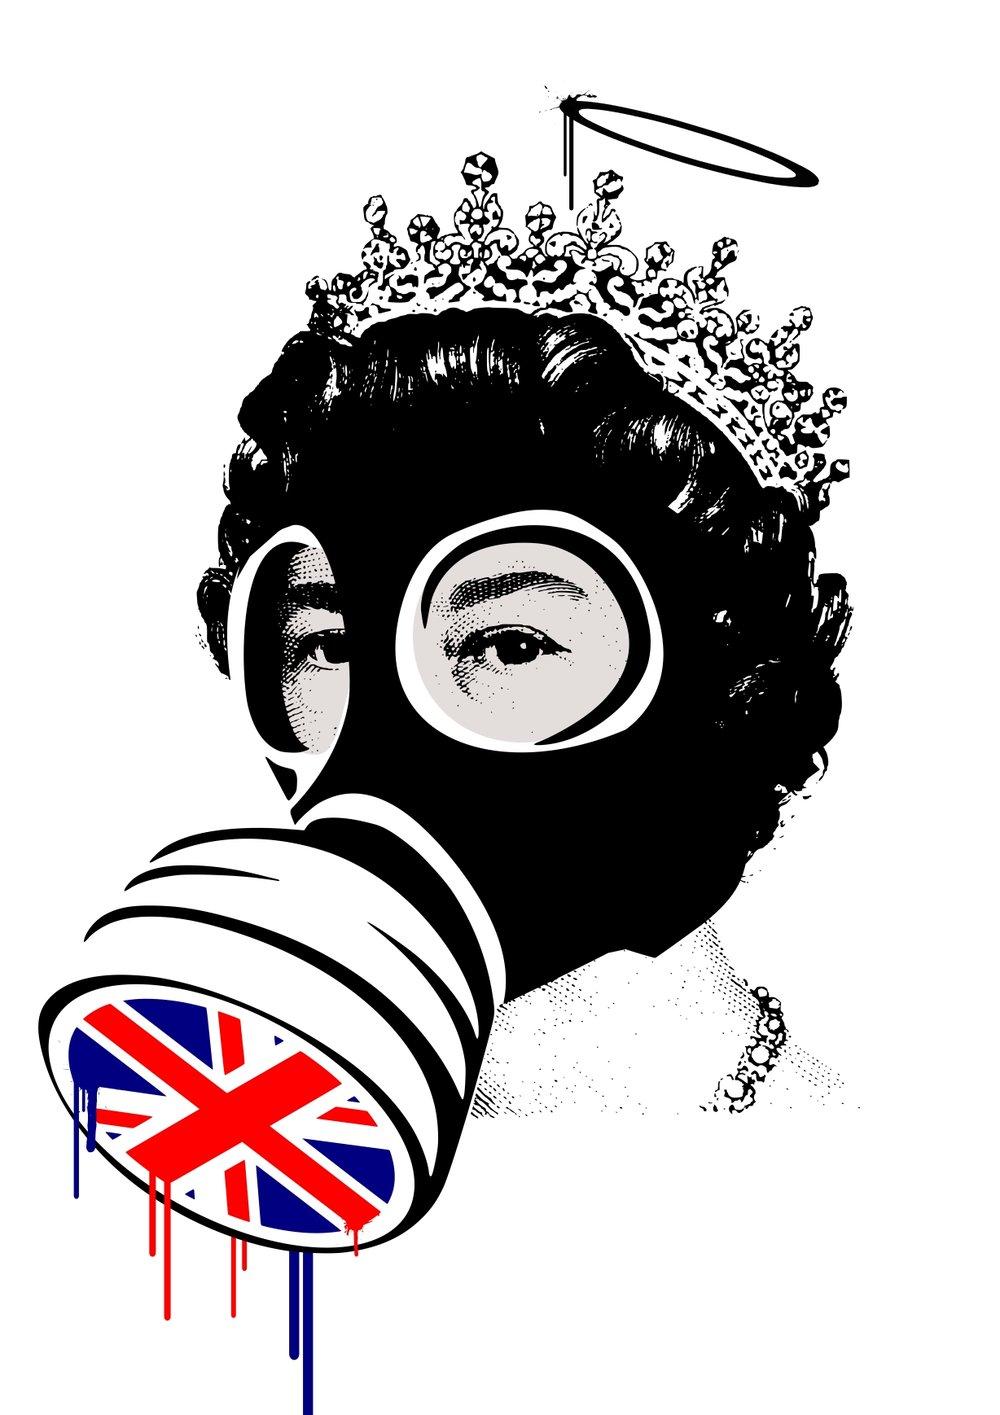 Image of British gas